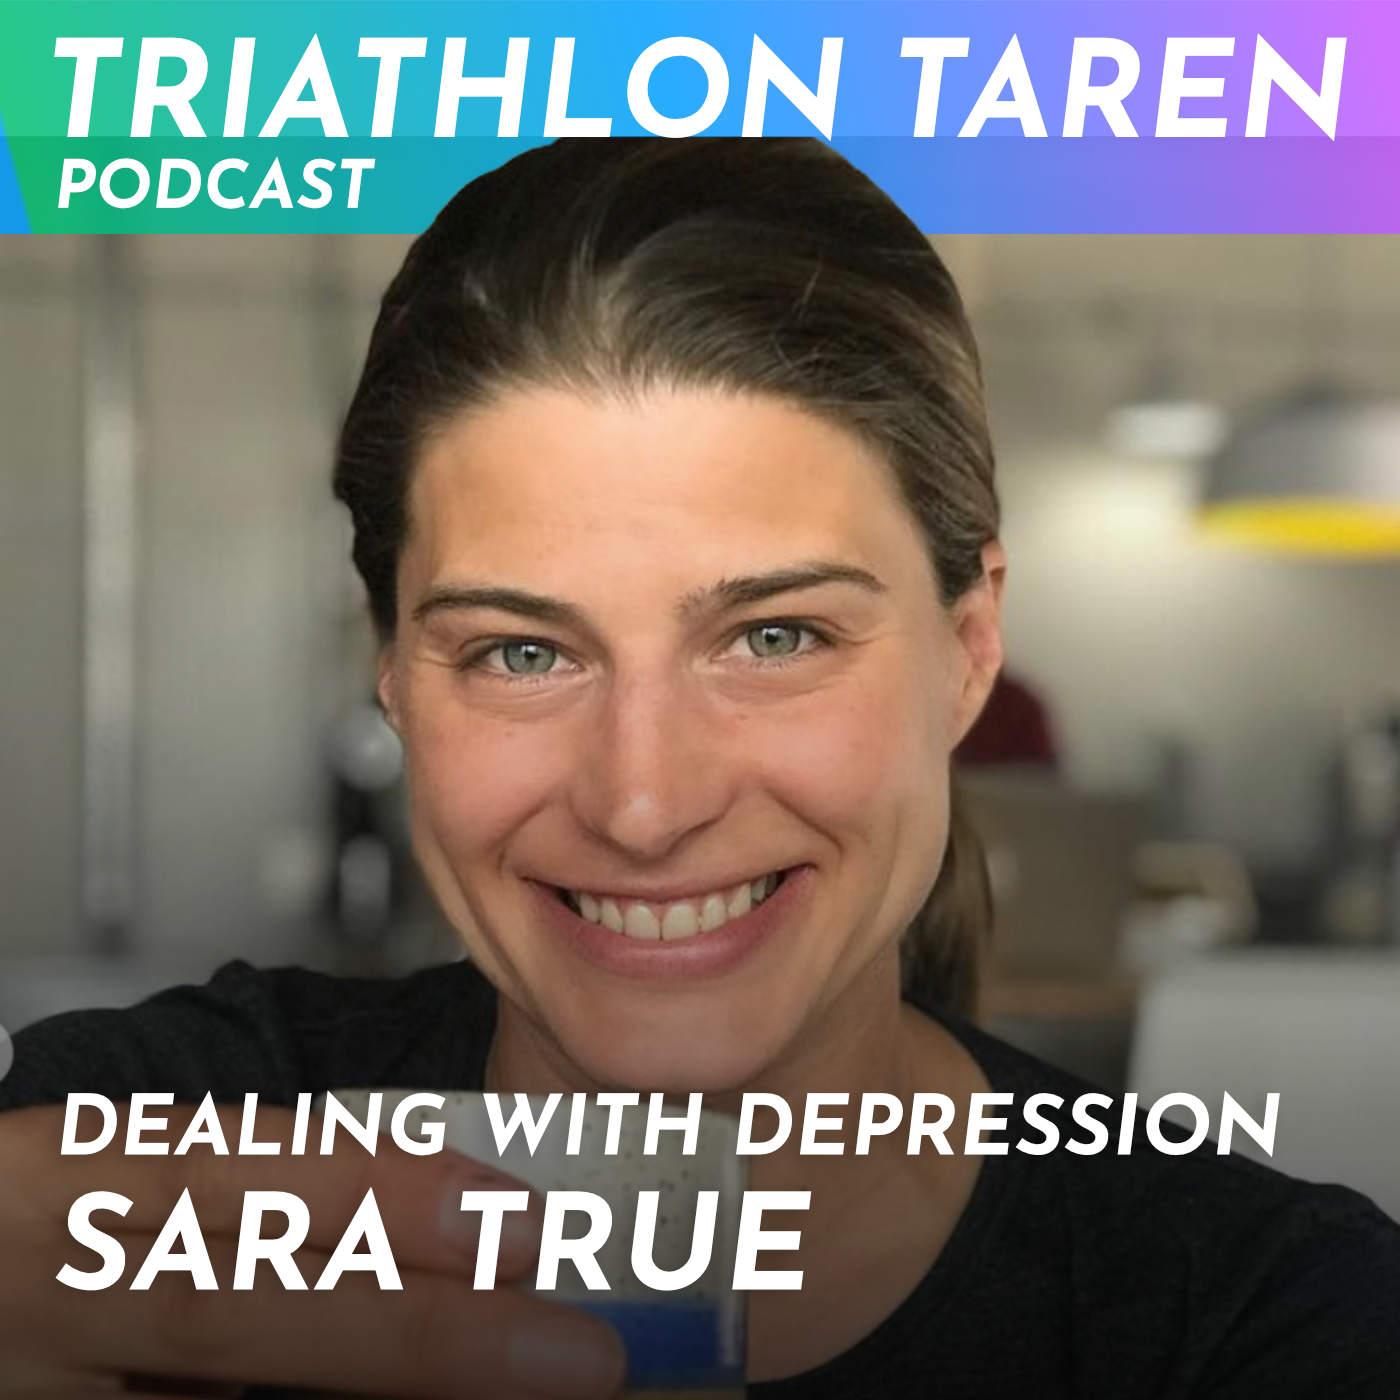 Sara True and Depression